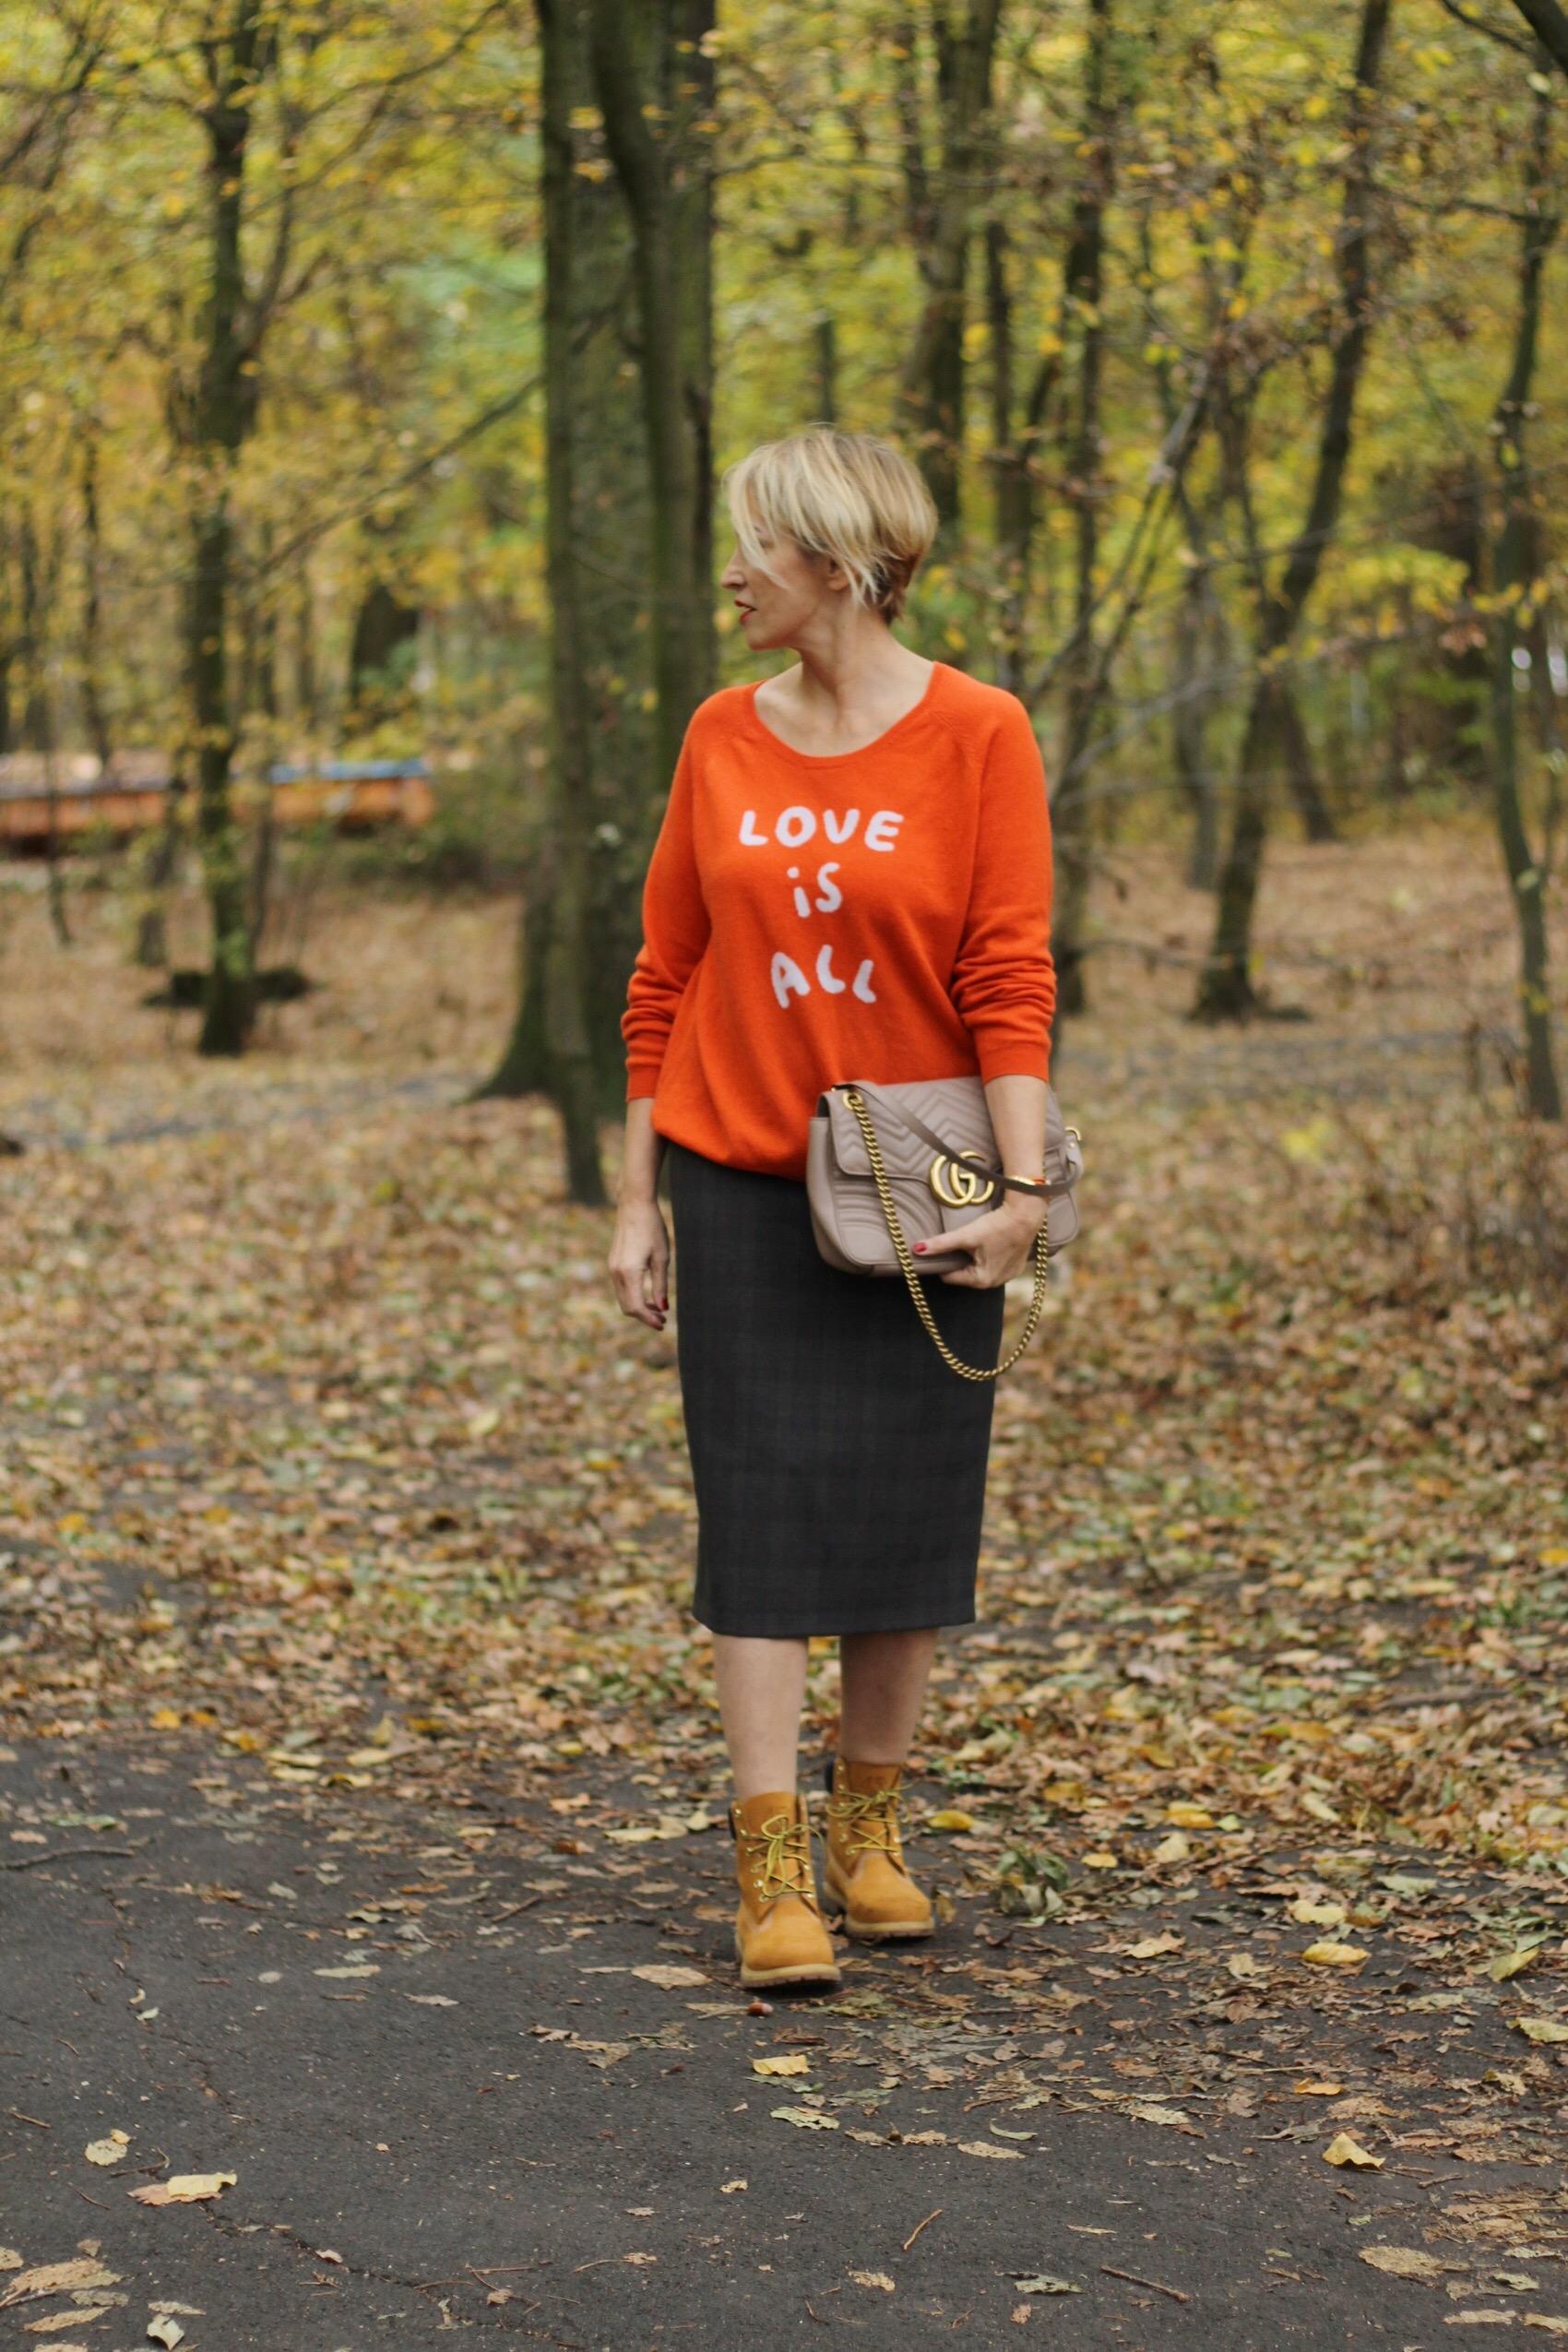 glamupyourlifestyle sylt kampen shoppen oranger-Pullover Ü-40-blog ü-50-blog ue-40-blog ue-50-blog